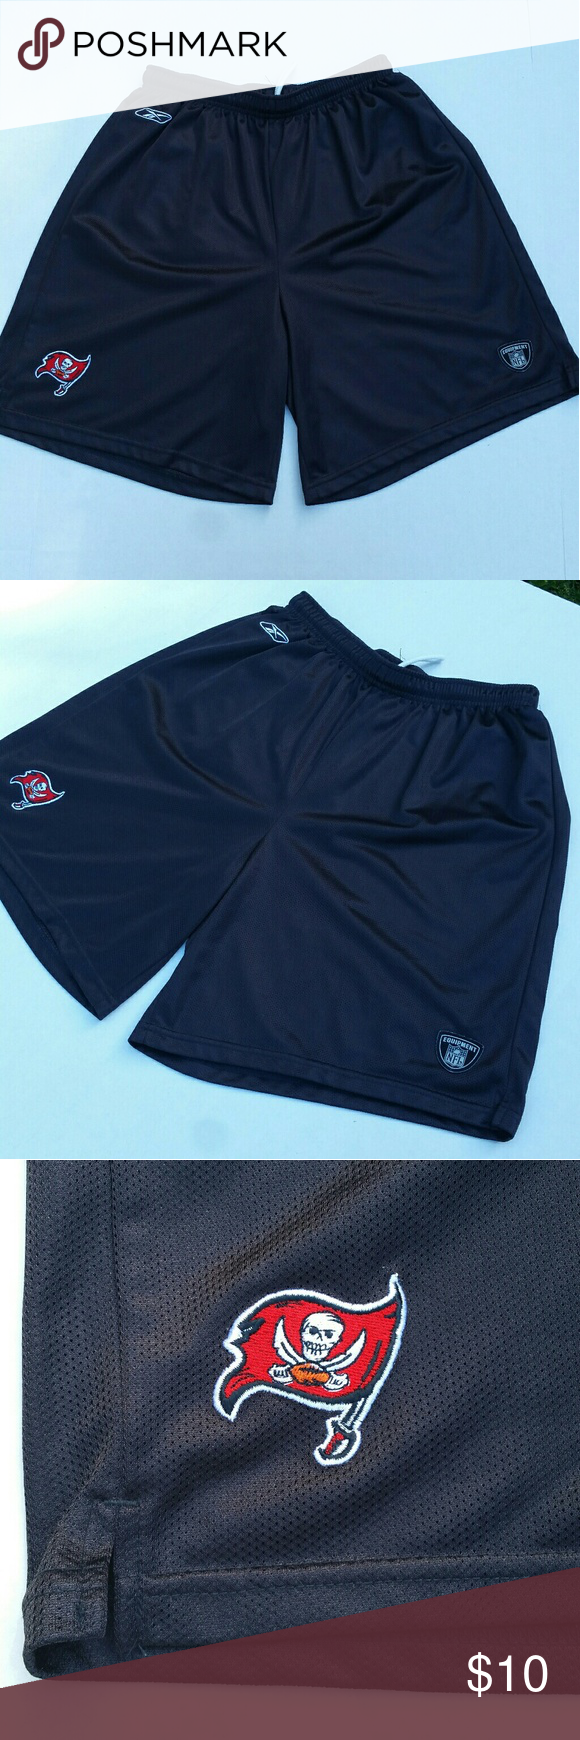 Vintage Reebok Buccaneers shorts Classic Reebok athletics